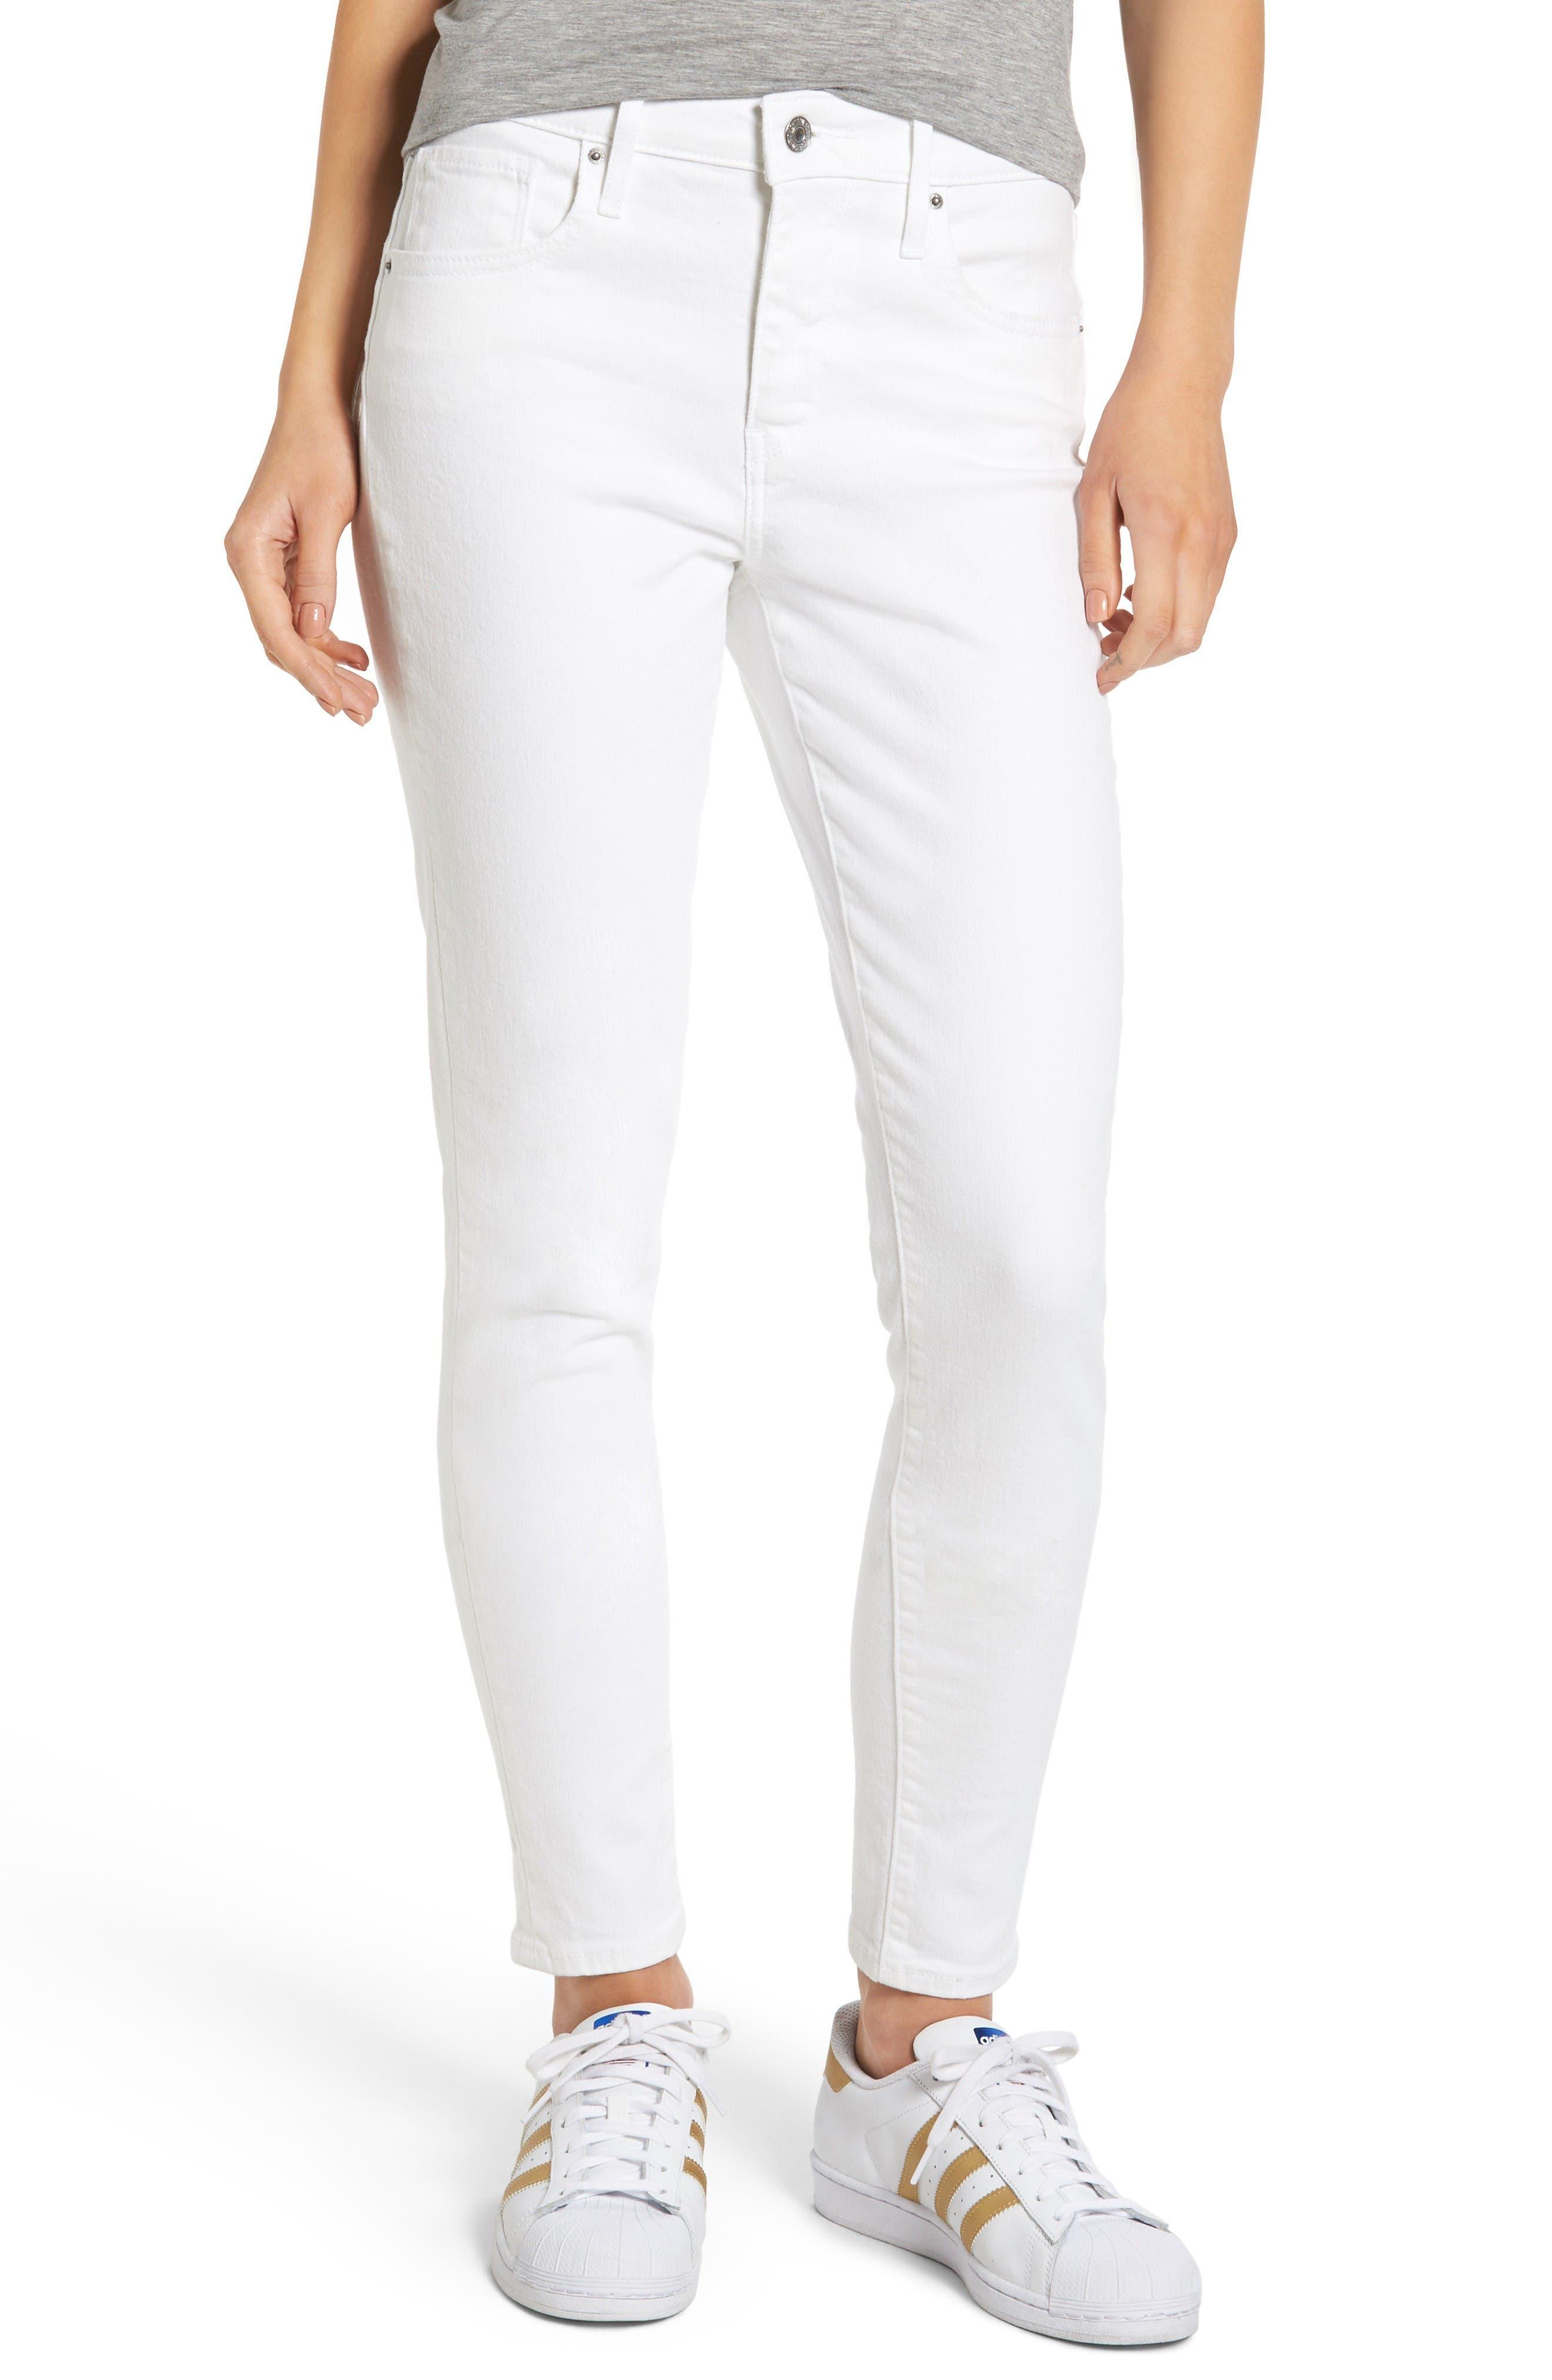 Main Image - Levi's® 721 High Rise Skinny Jeans